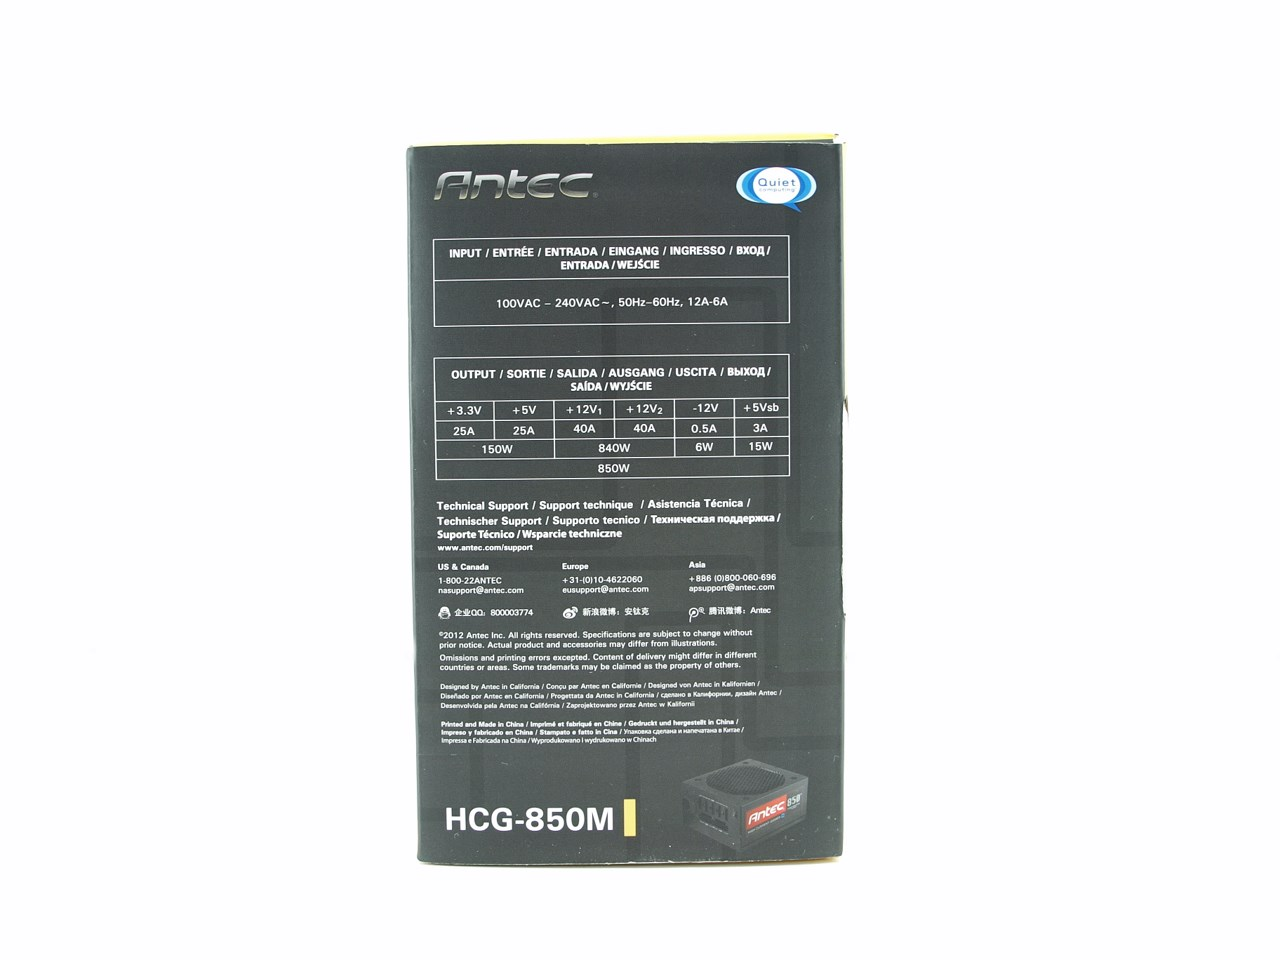 Antec HCG-850M 850W Power Supply Unit Review